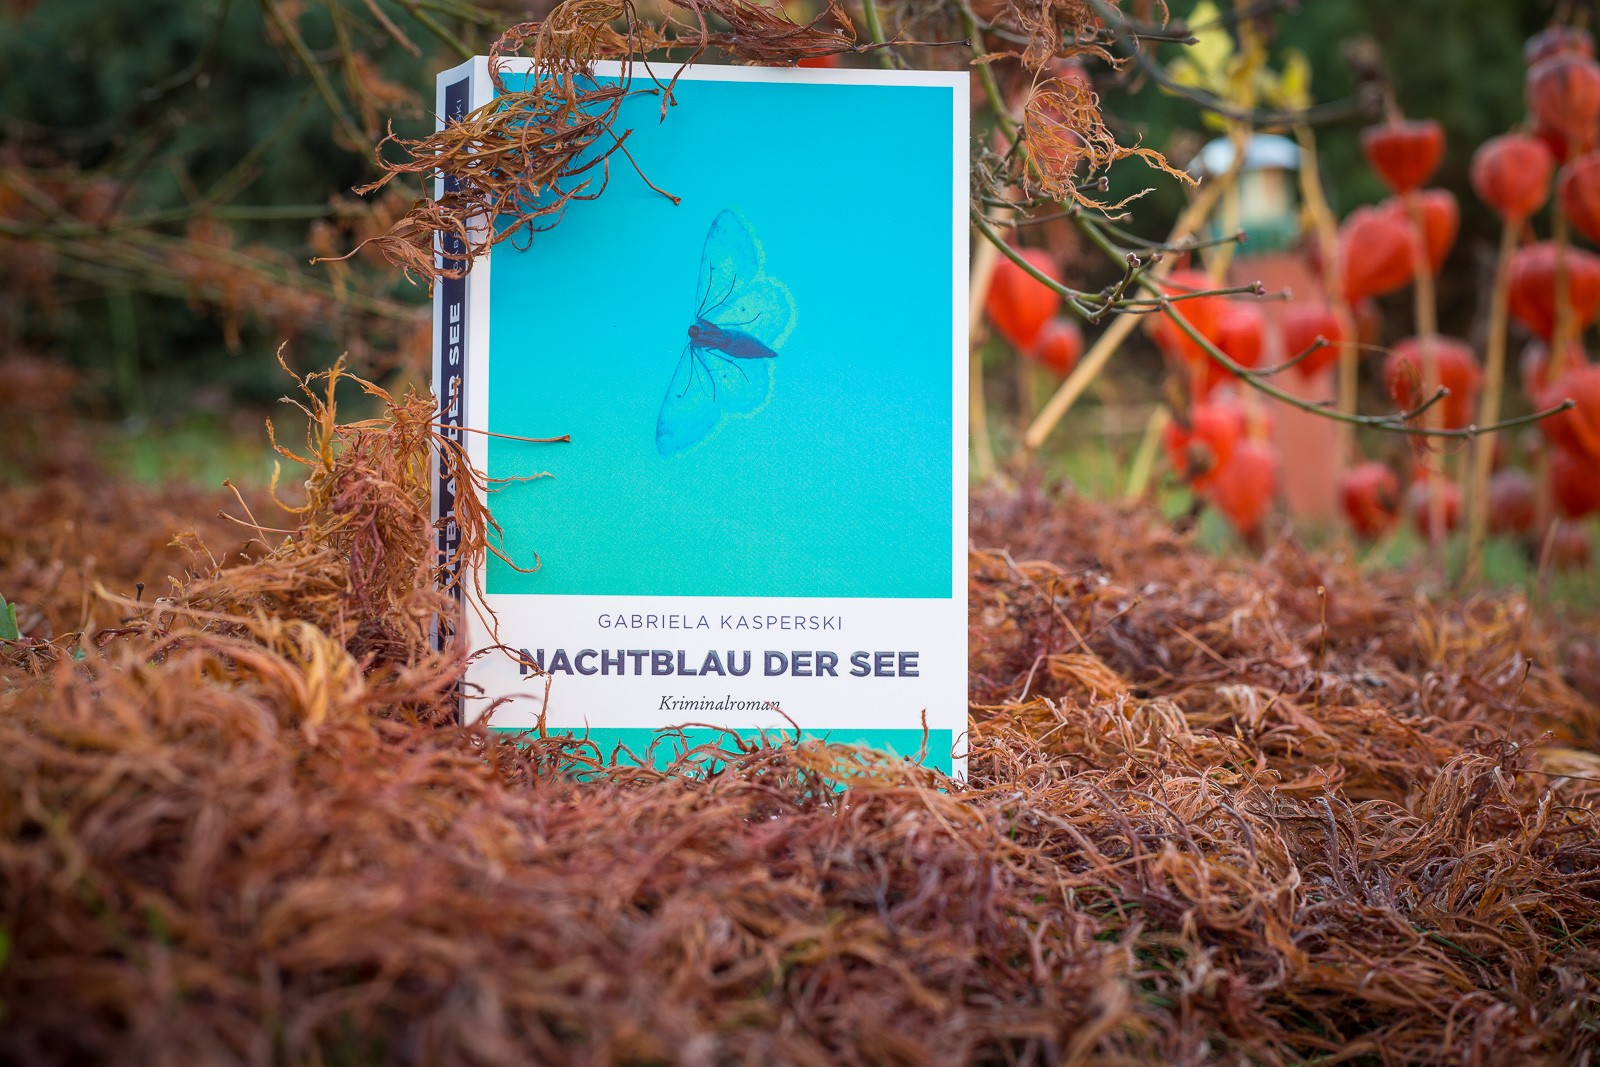 Nachtblau der See - Gabriela Kasperki